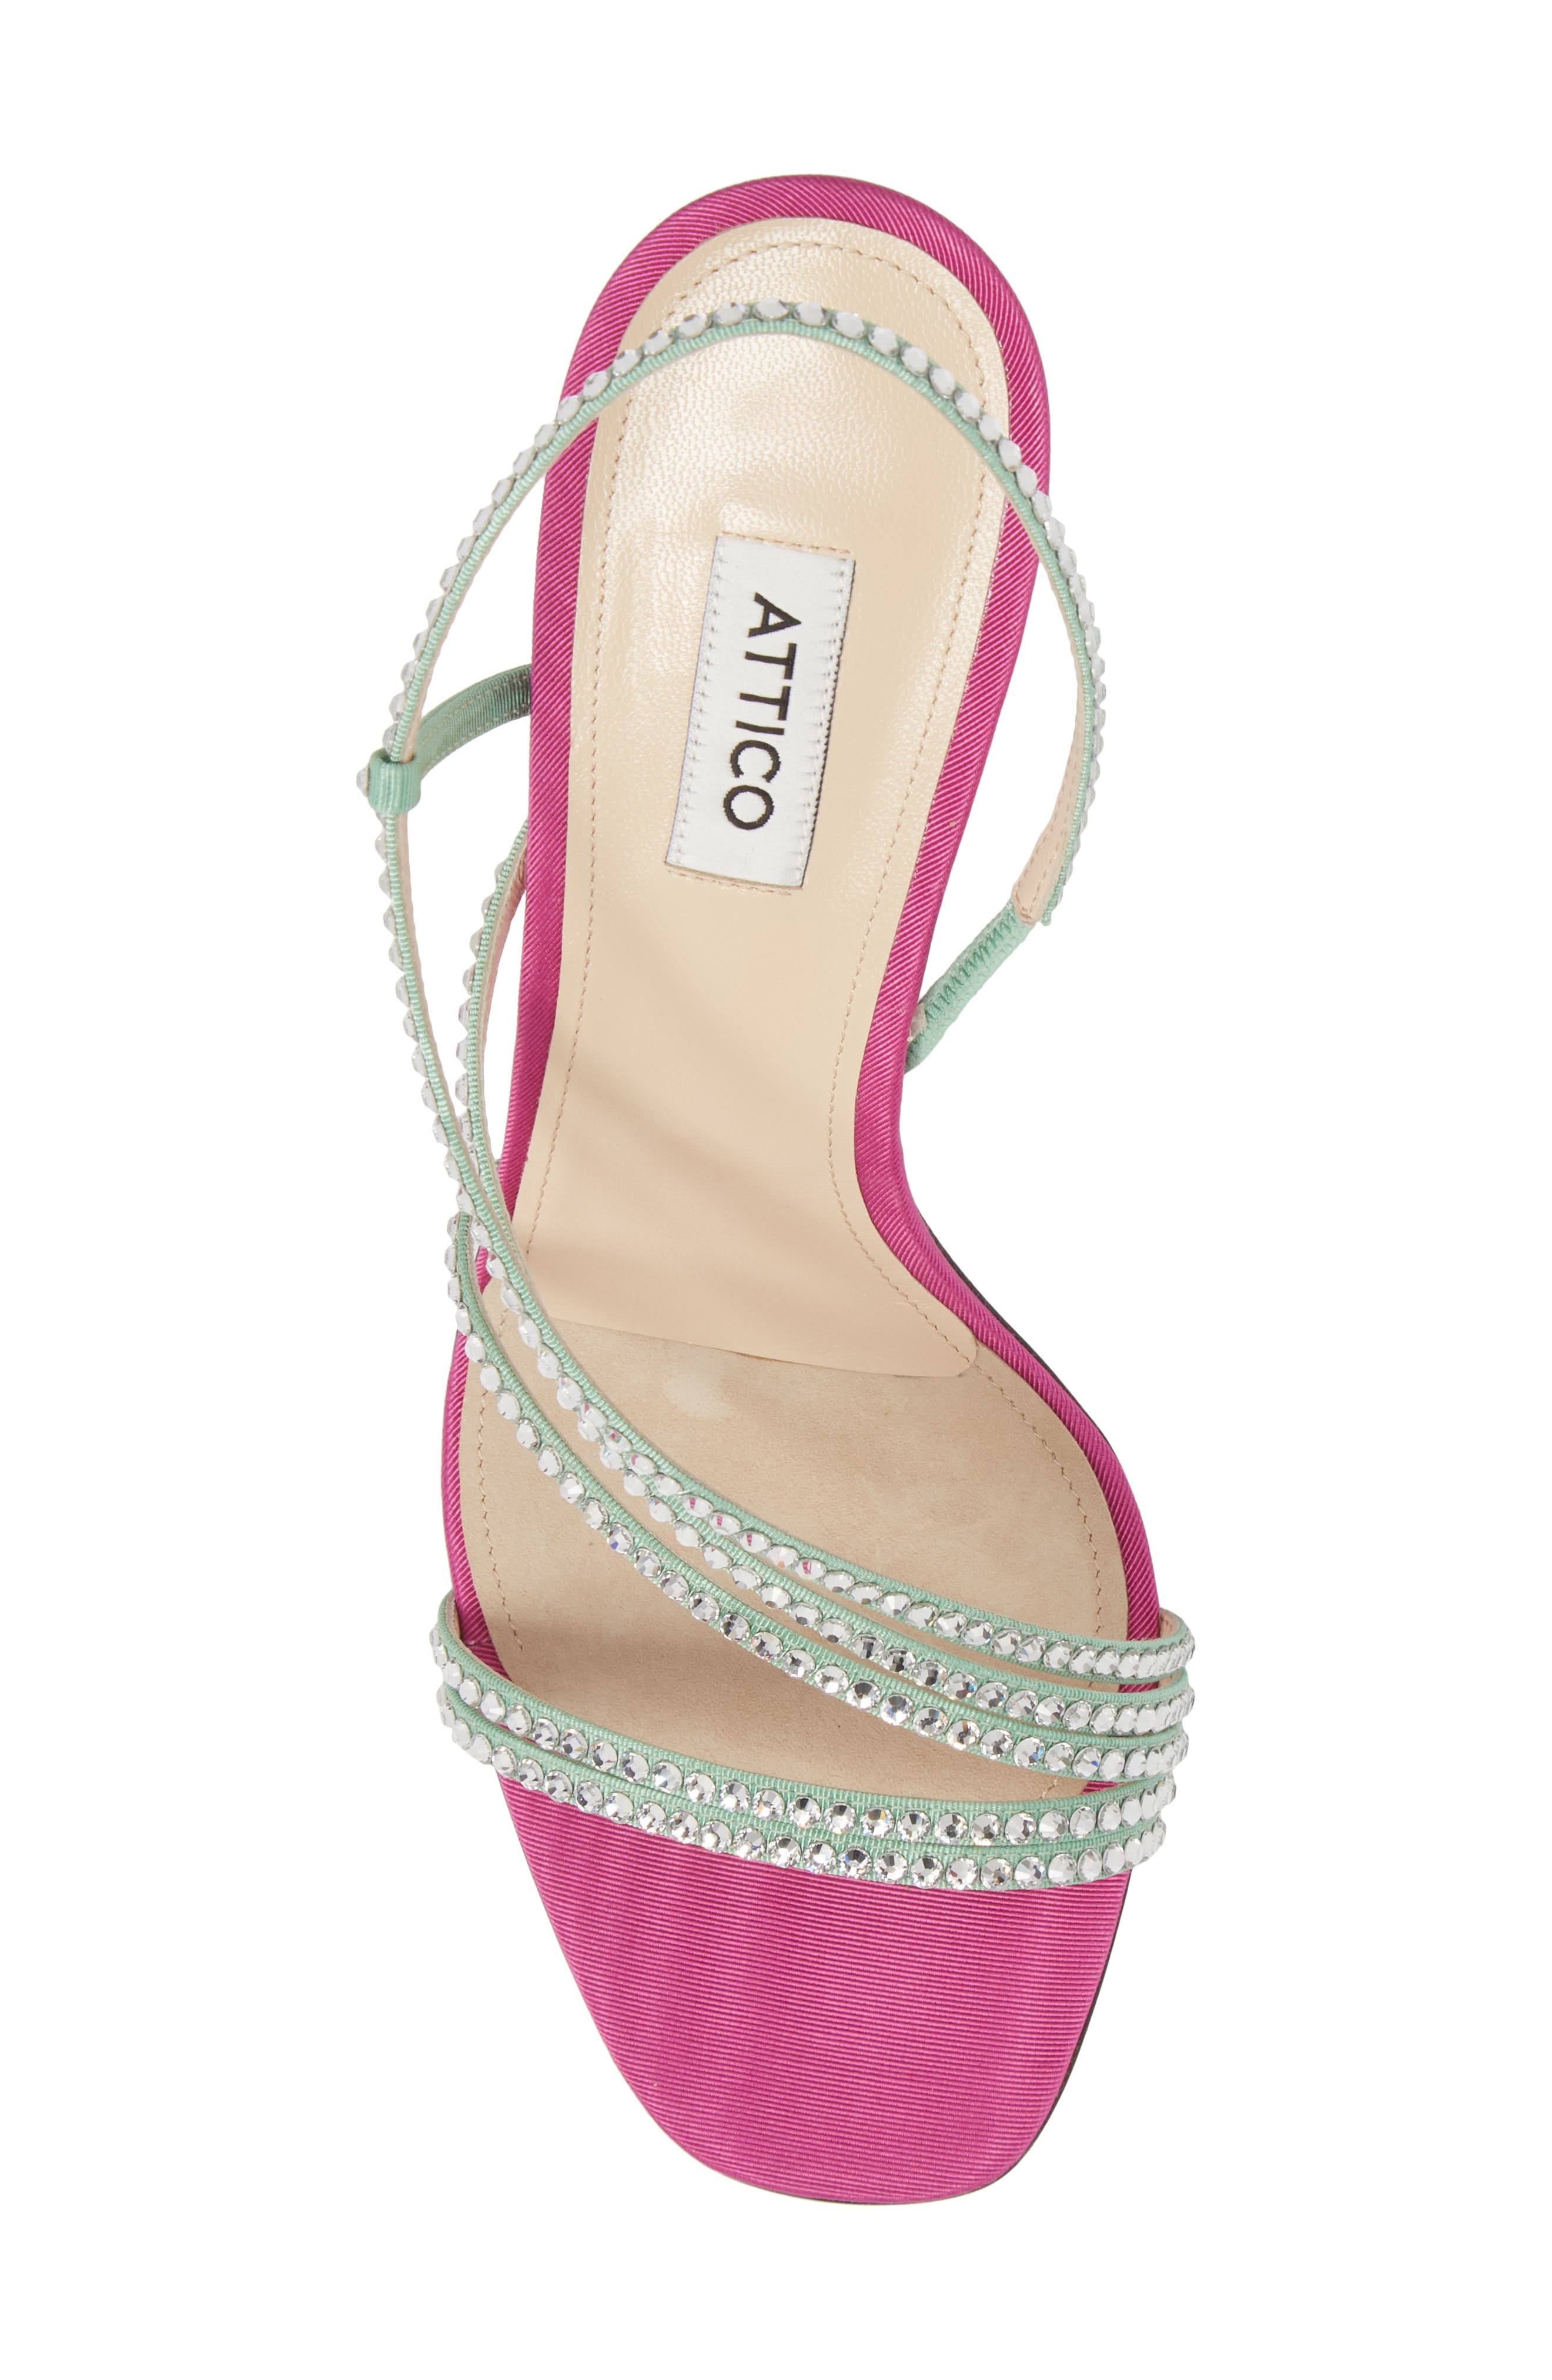 Crystal Embellished Strappy Sandal,                             Alternate thumbnail 5, color,                             Pink/ Silver